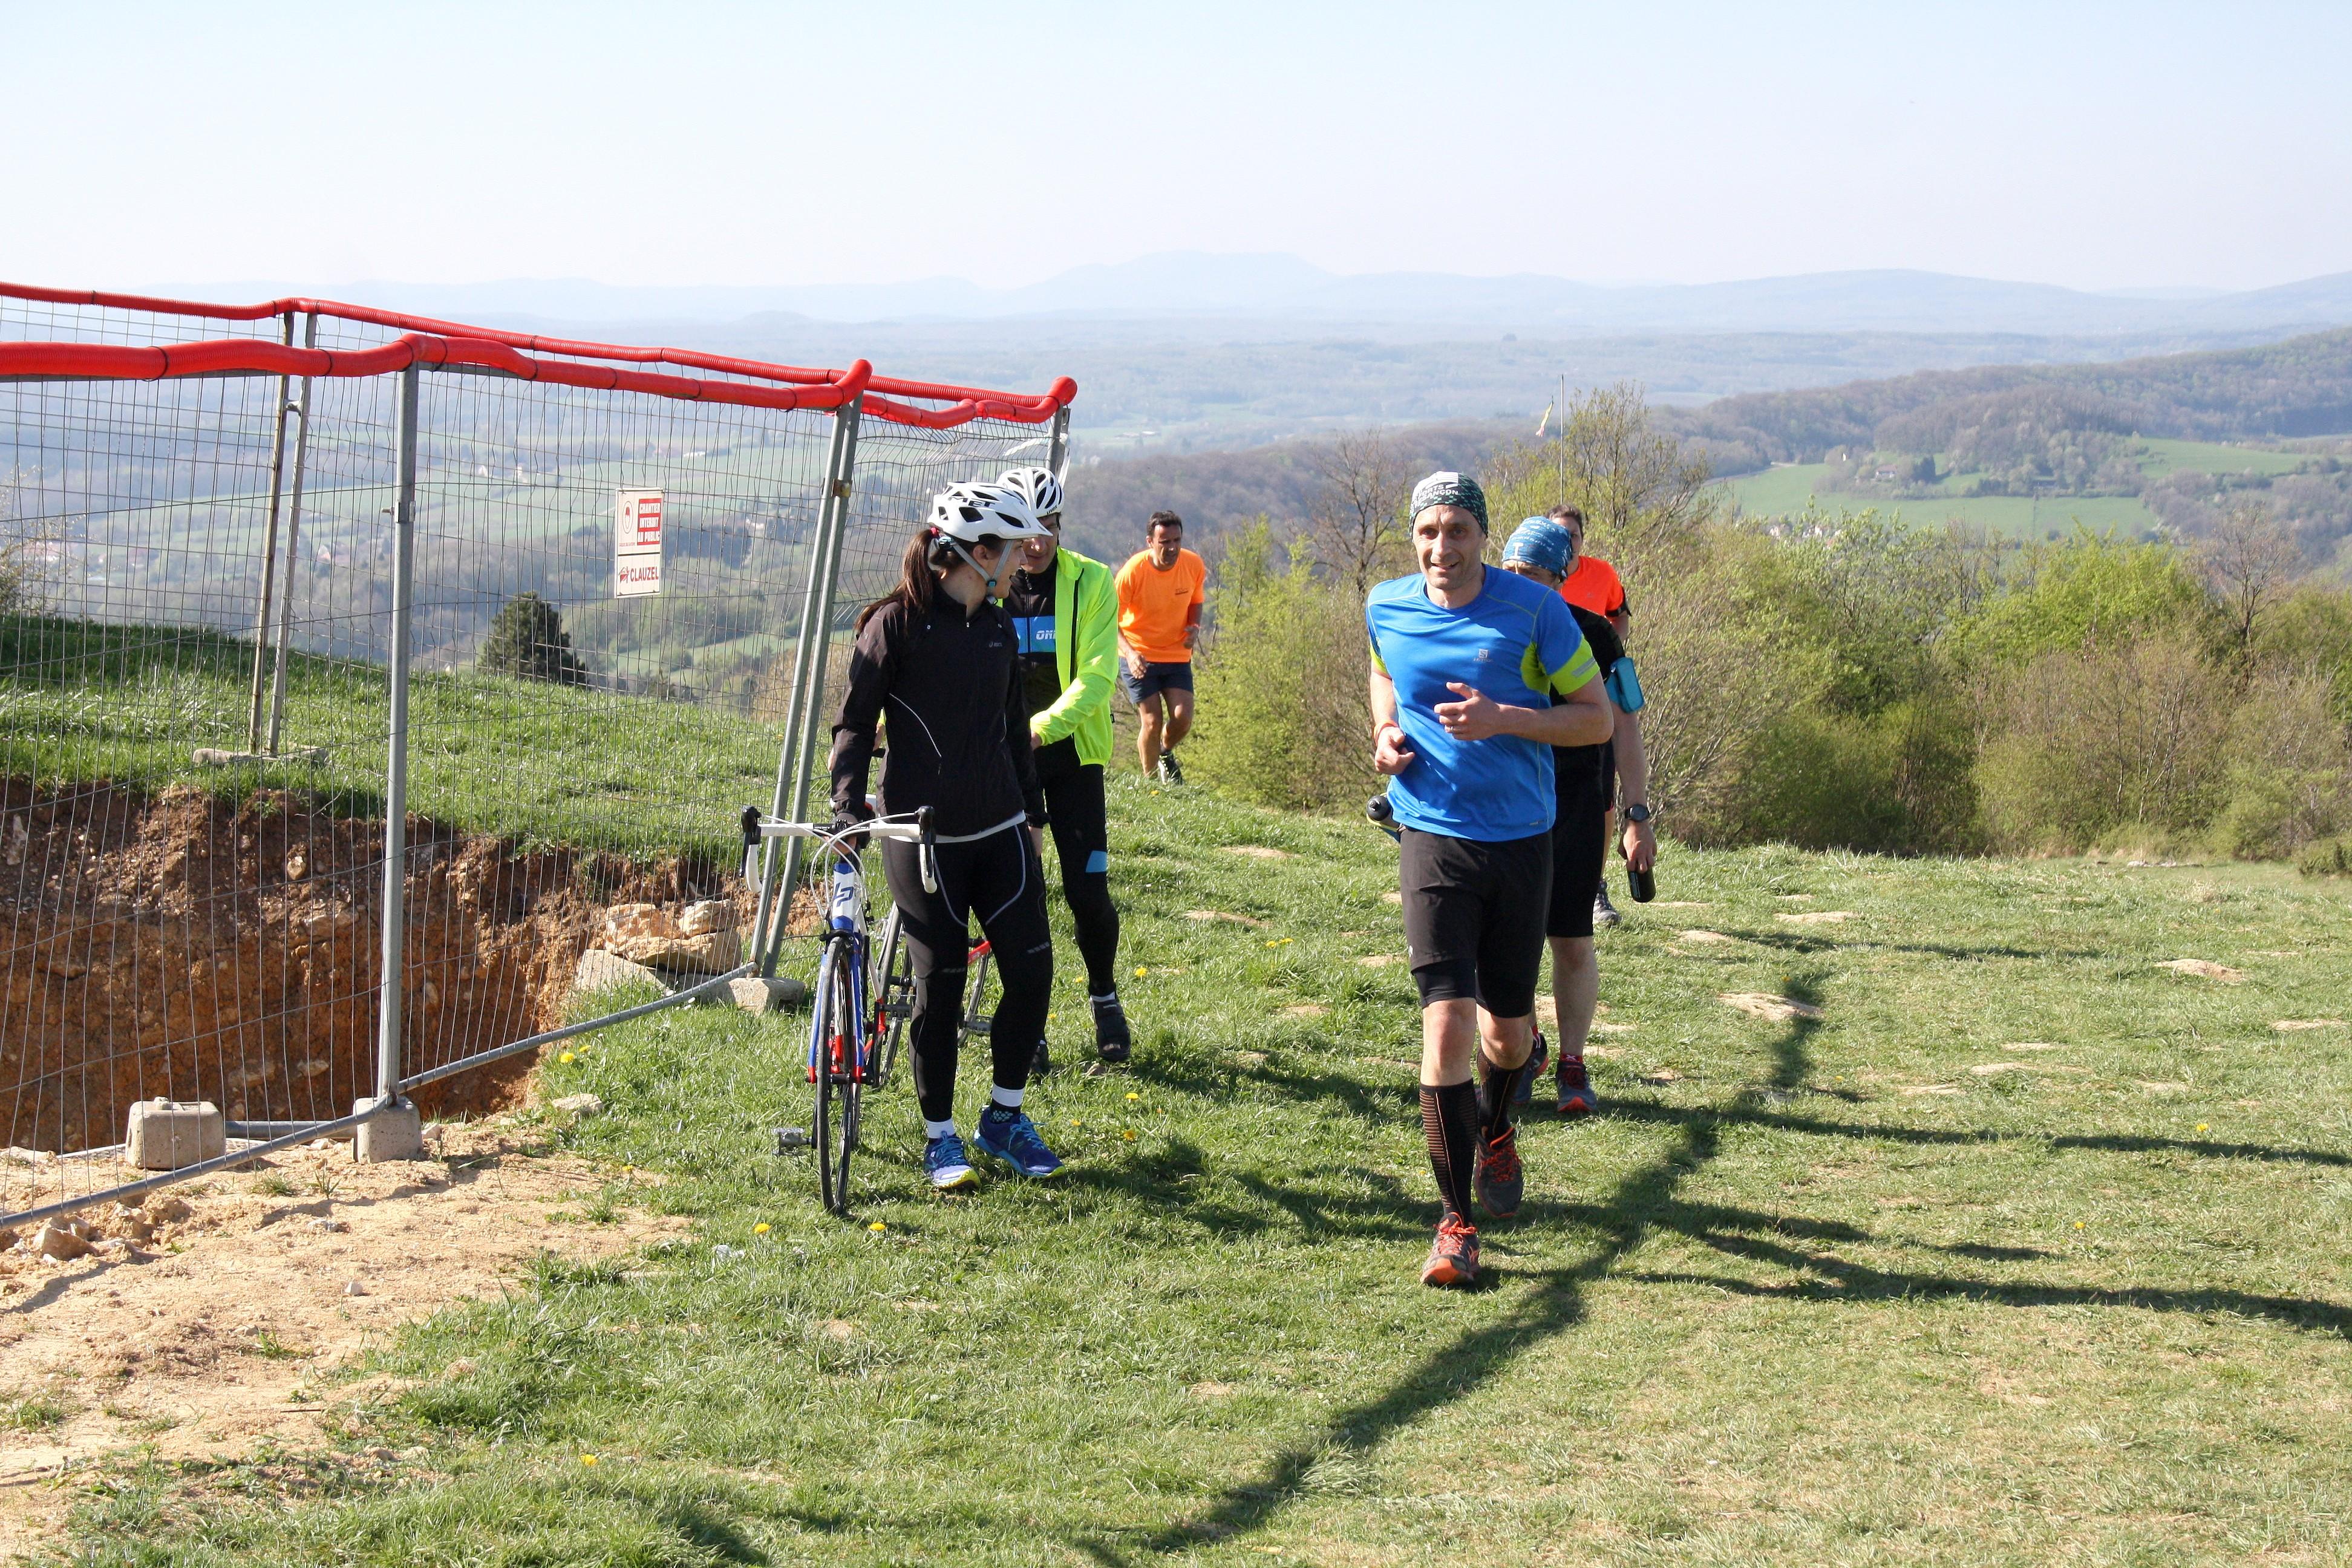 2017-04-09 - Trail-Montfaucon (263)